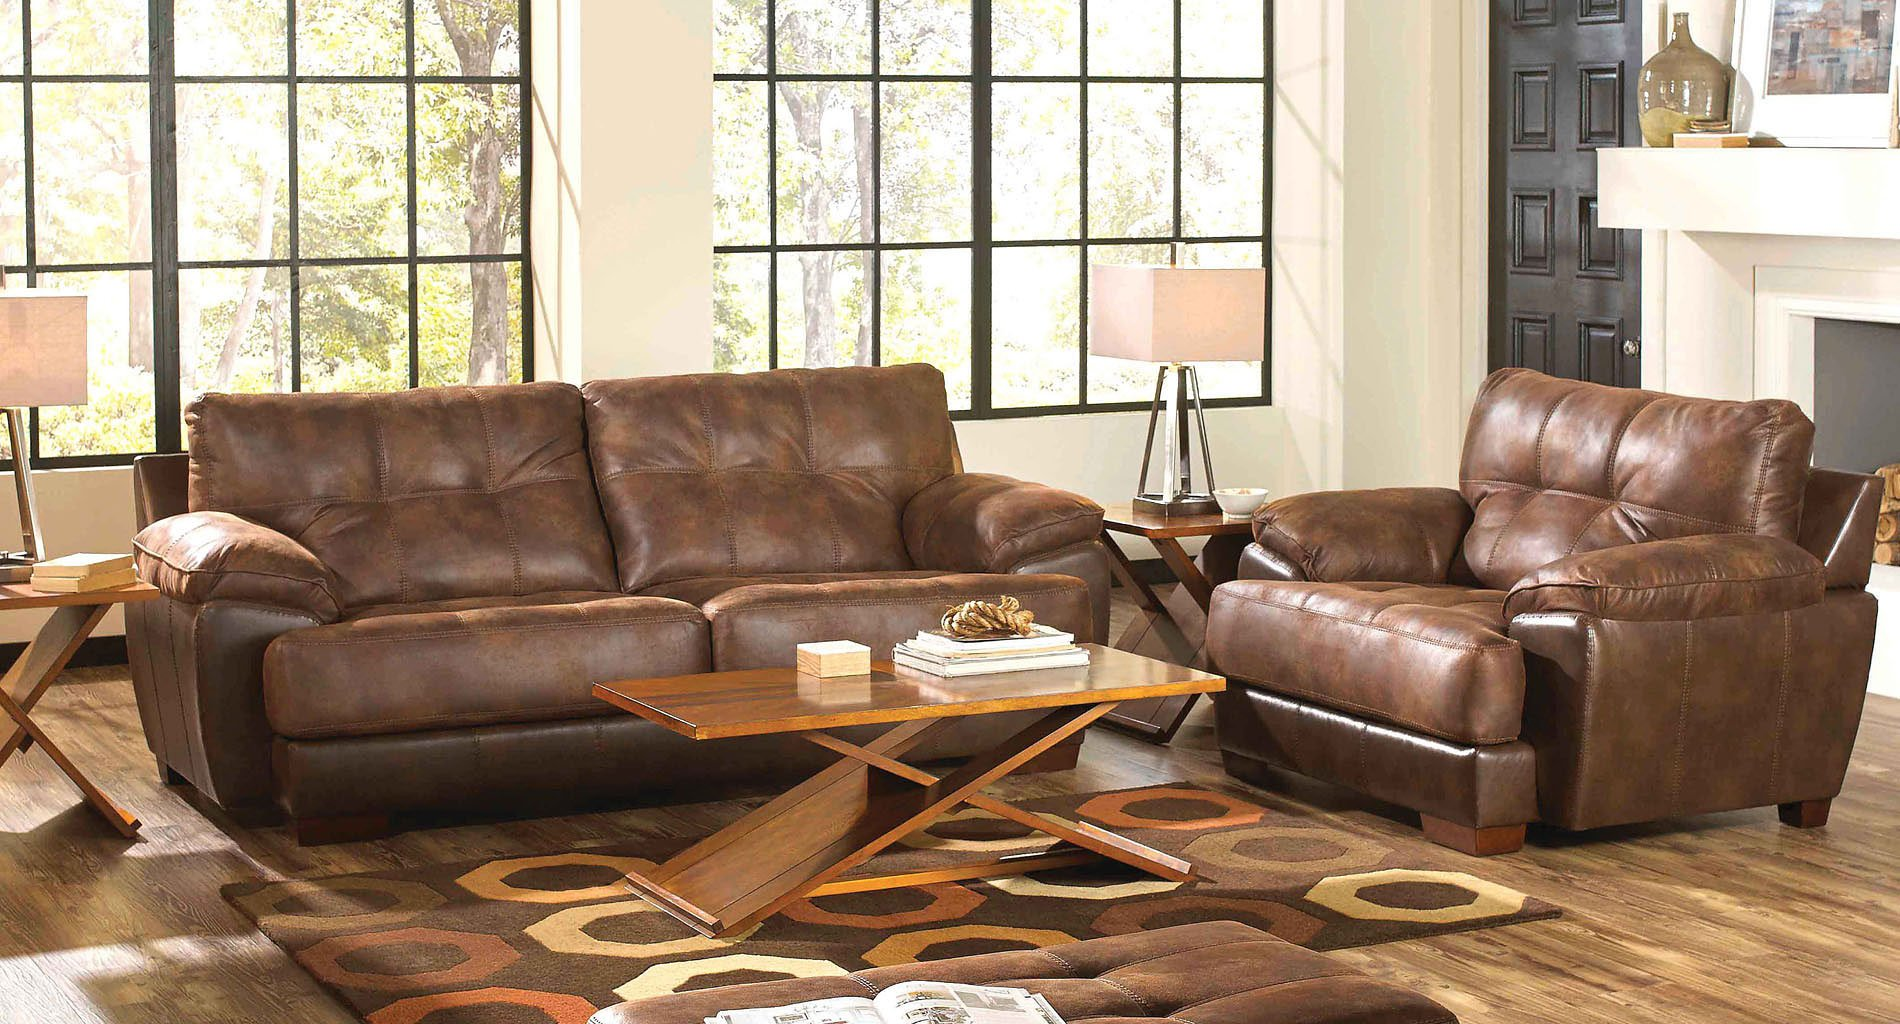 Drummond Living Room Set (Sunset)